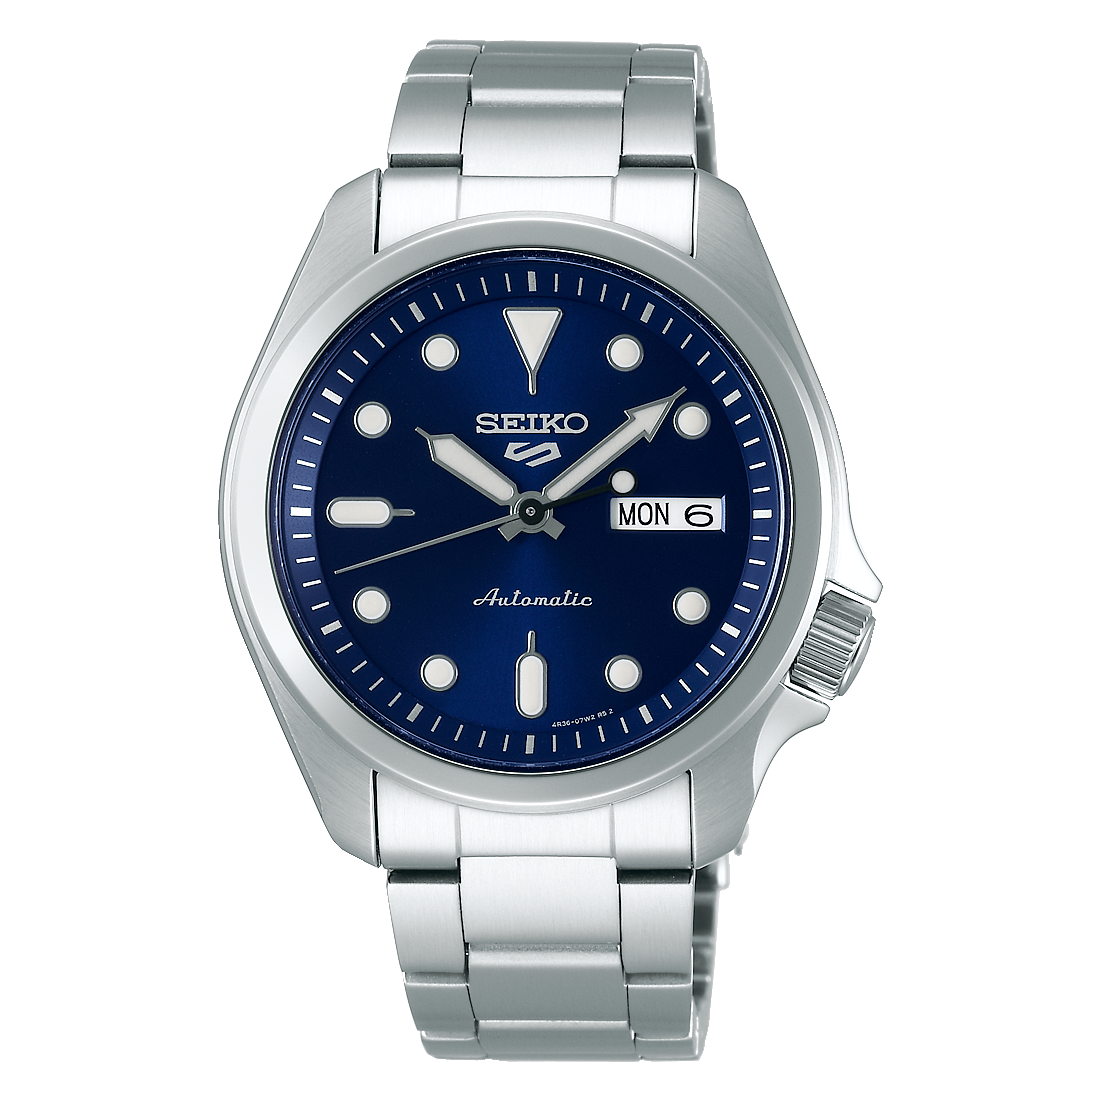 Seiko Seiko 5 Sports horloge Automatic SRPE53K1